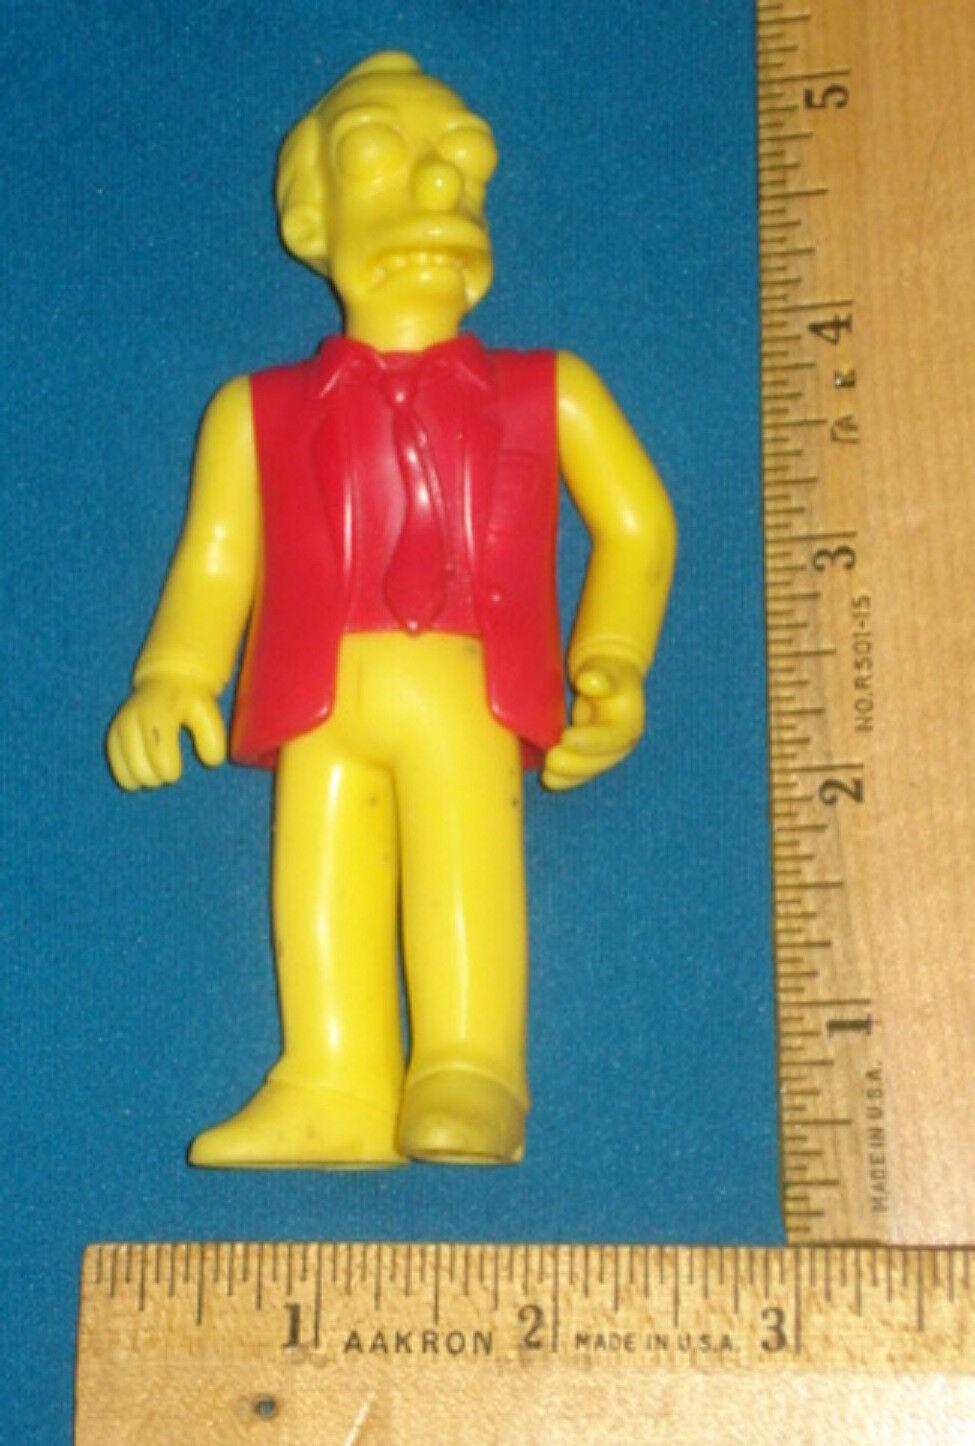 Prototype Test Shot Figure Playmates Simpsons 2002 Gil (Version 4 -V4) Wave 11